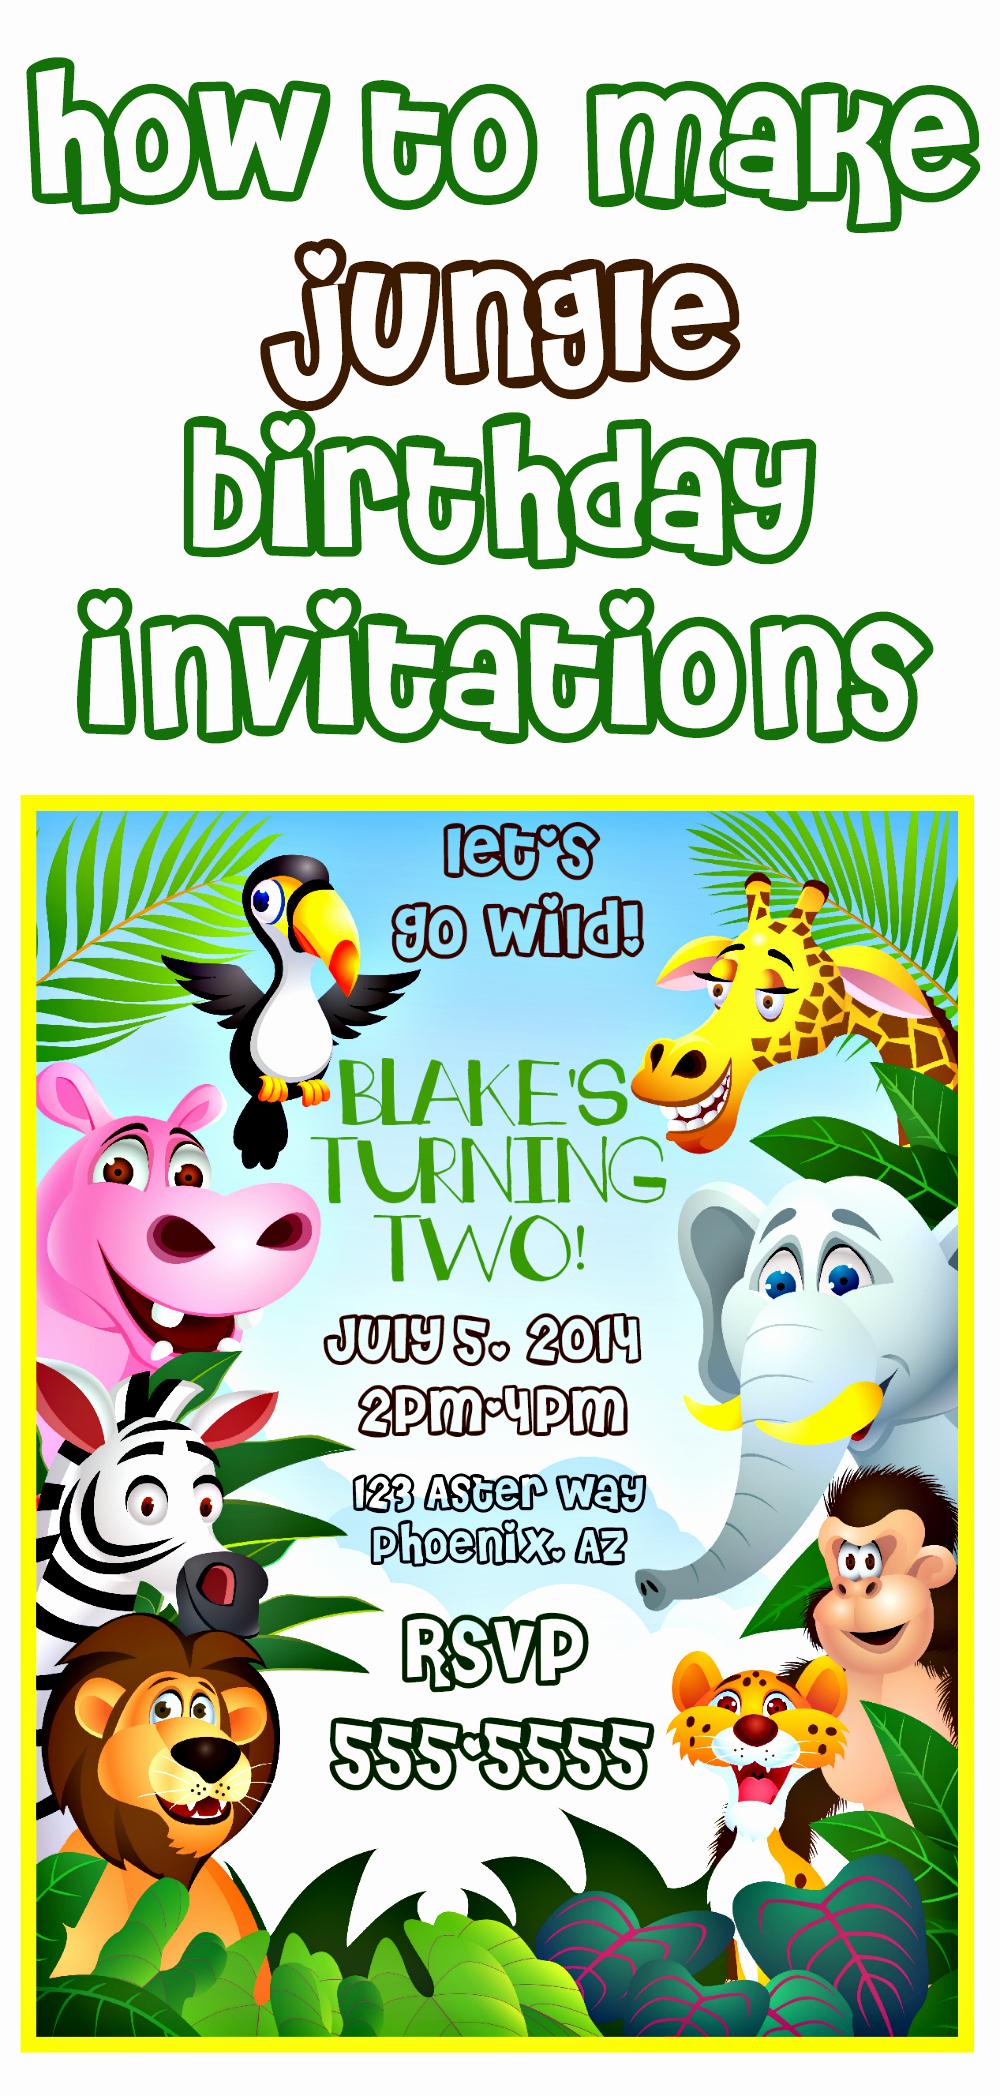 Jungle theme Birthday Invitation New How to Make Jungle themed Invitations